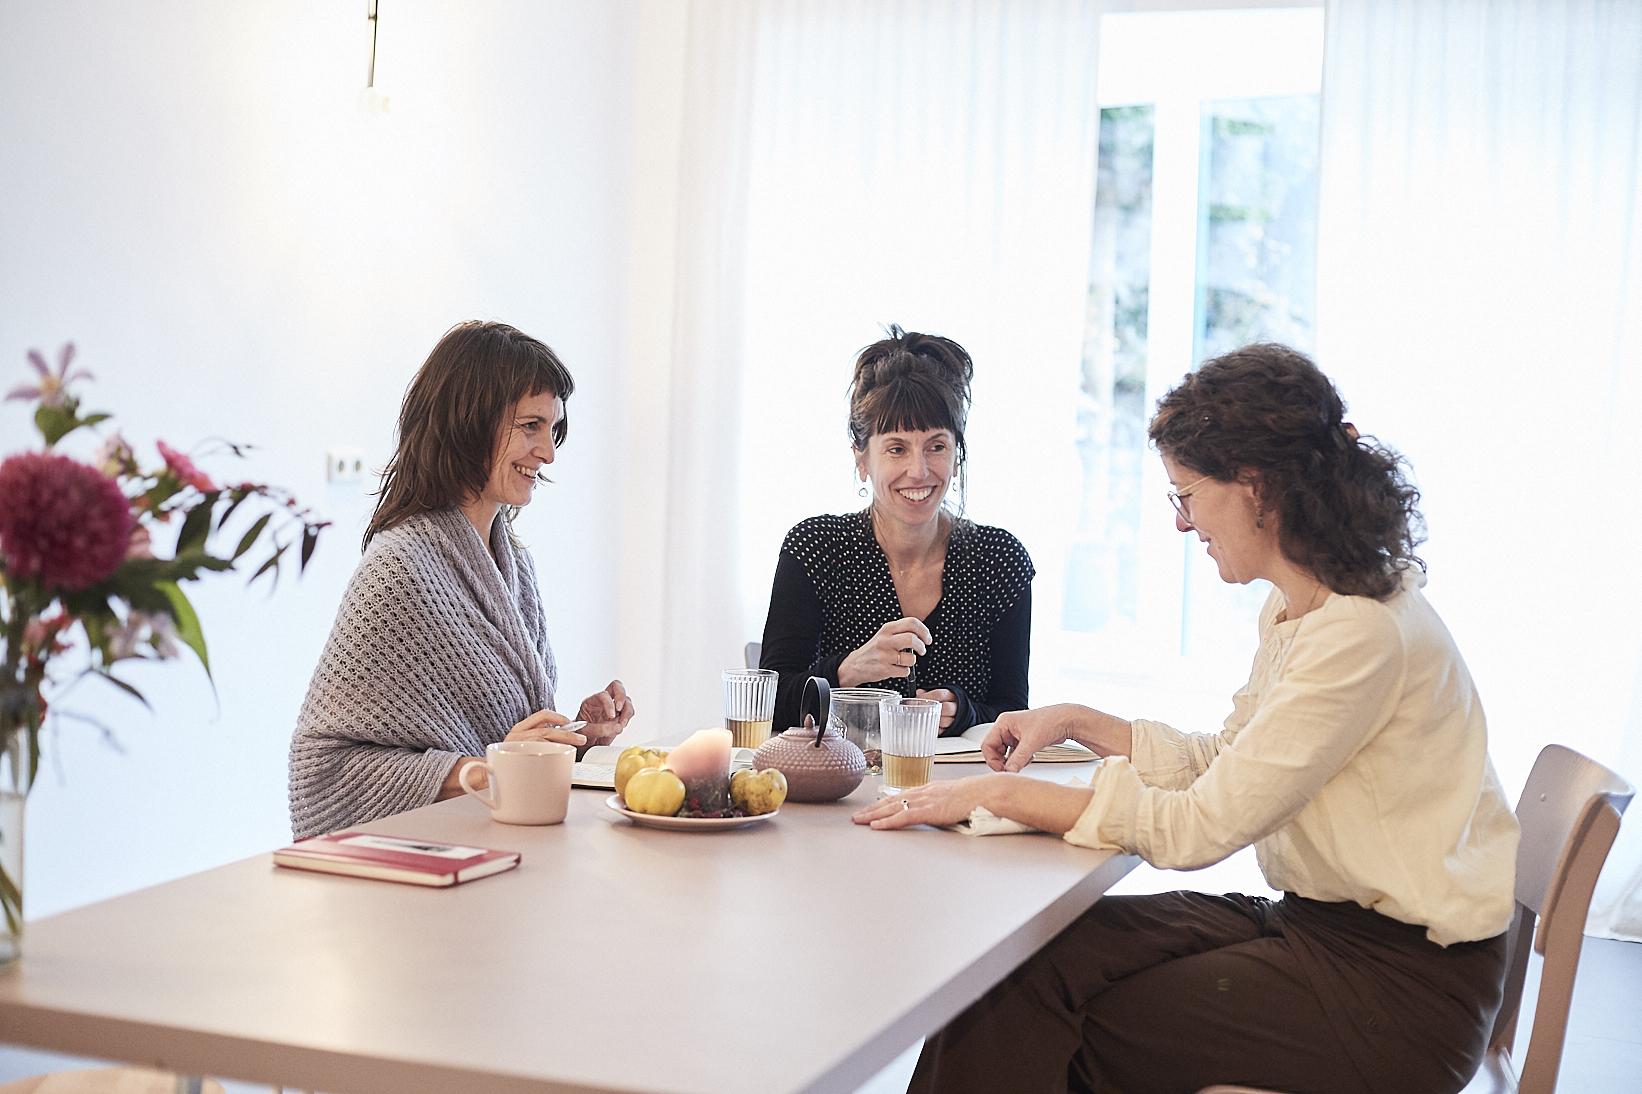 Anja Haag, Tamara Will, Edna Scheibe, raum Ottensen